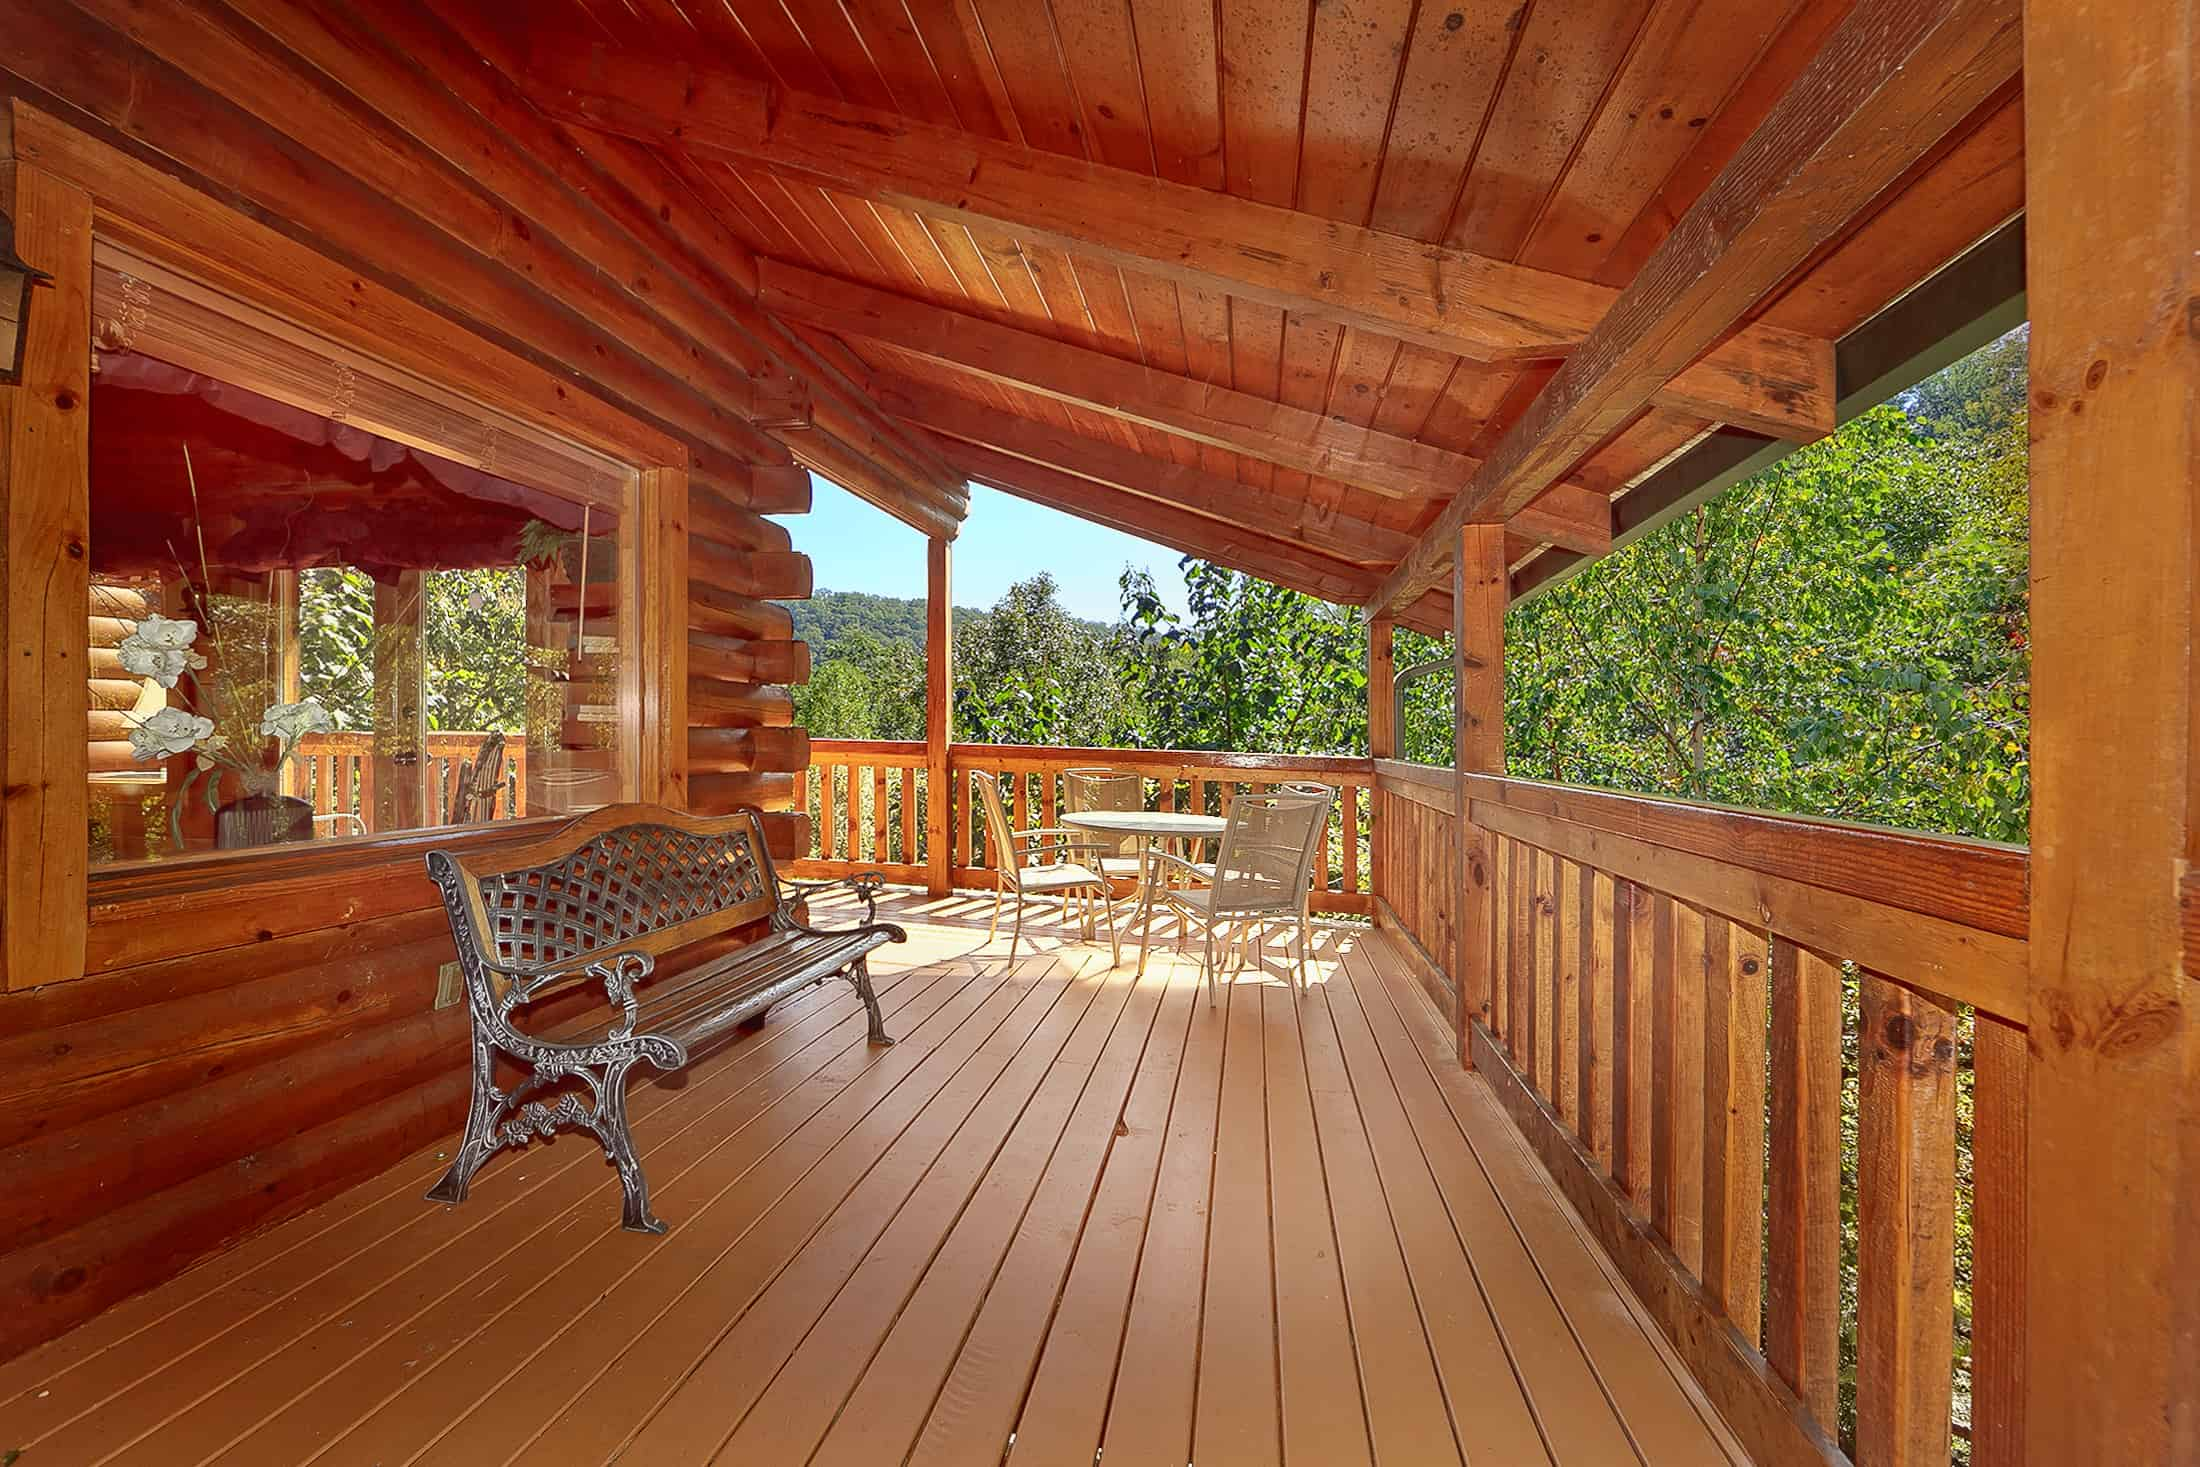 honeymoon log edited alan tn s mountain cabins chalet secluded gatlinburg mollys rentals cabin tennessee